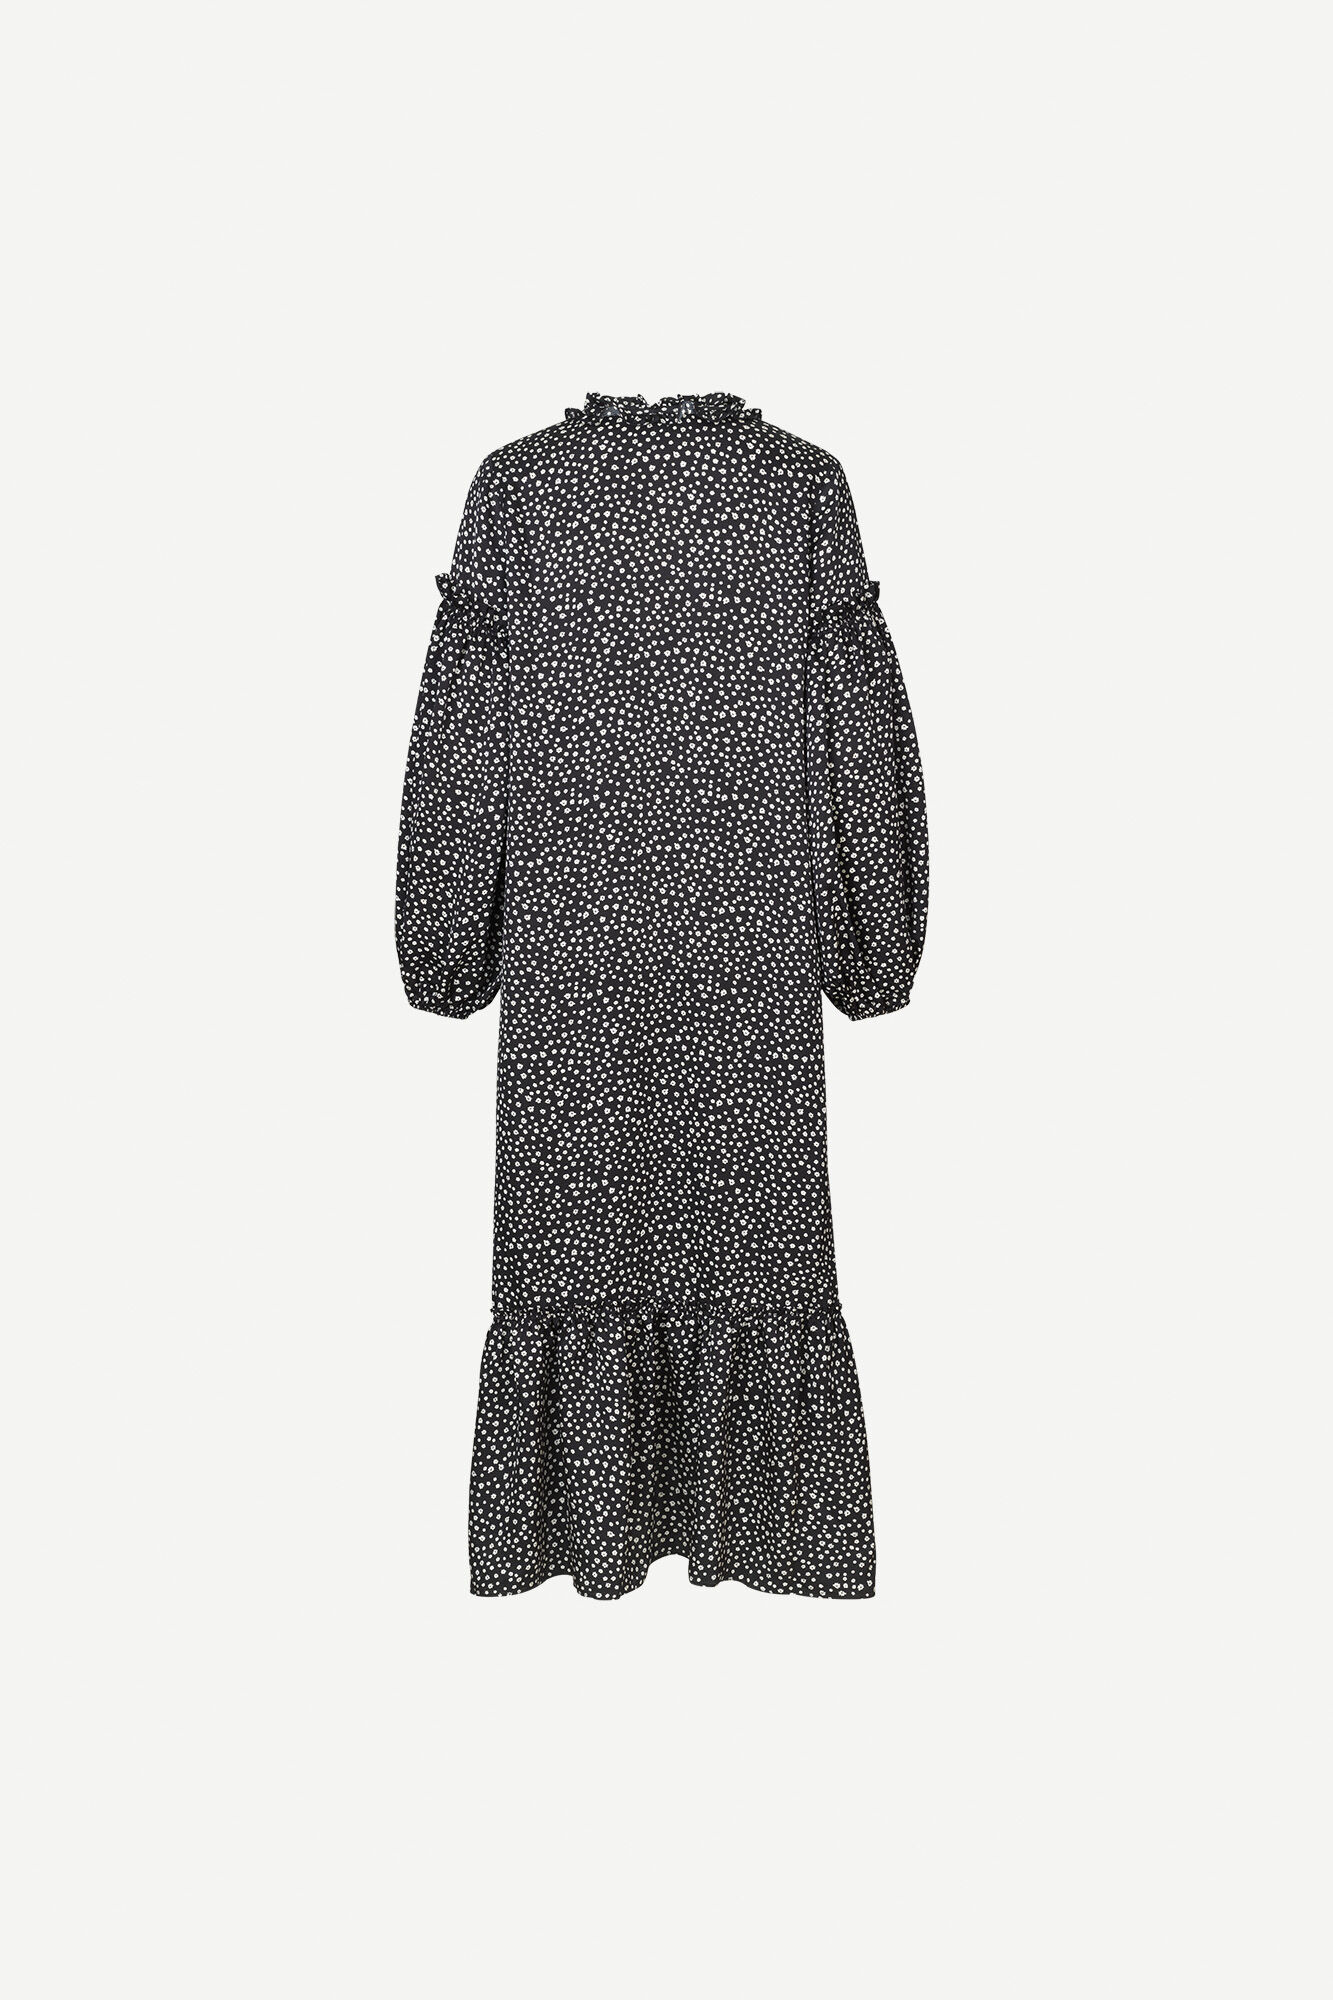 Vivre dress aop 12887, BLACK BLOSSOM